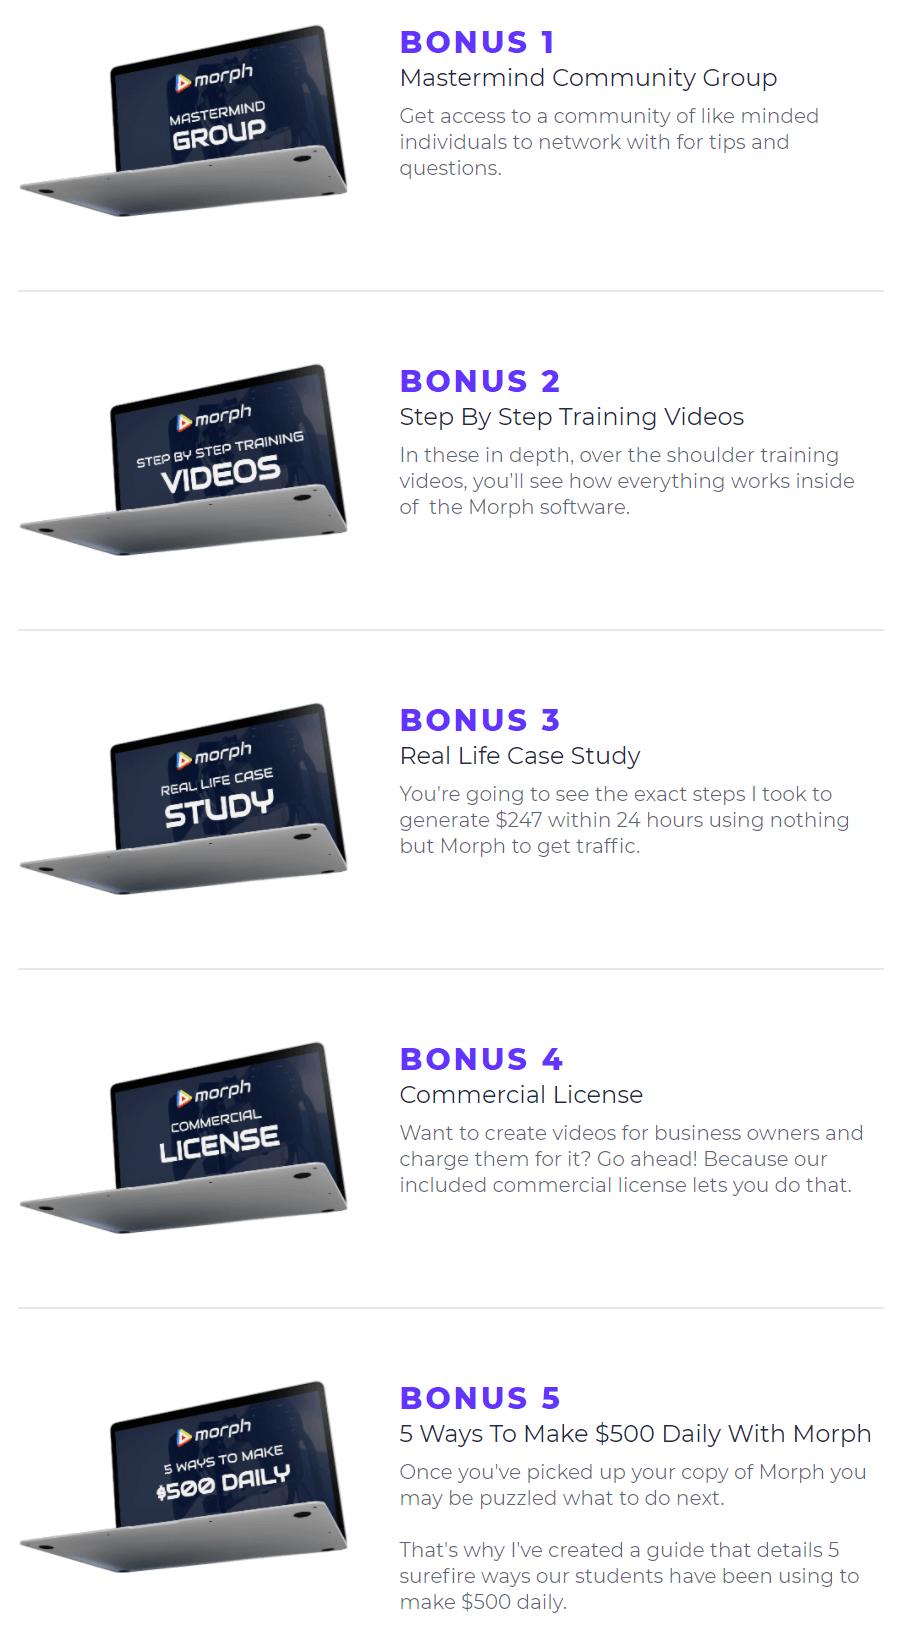 Morph-bonus